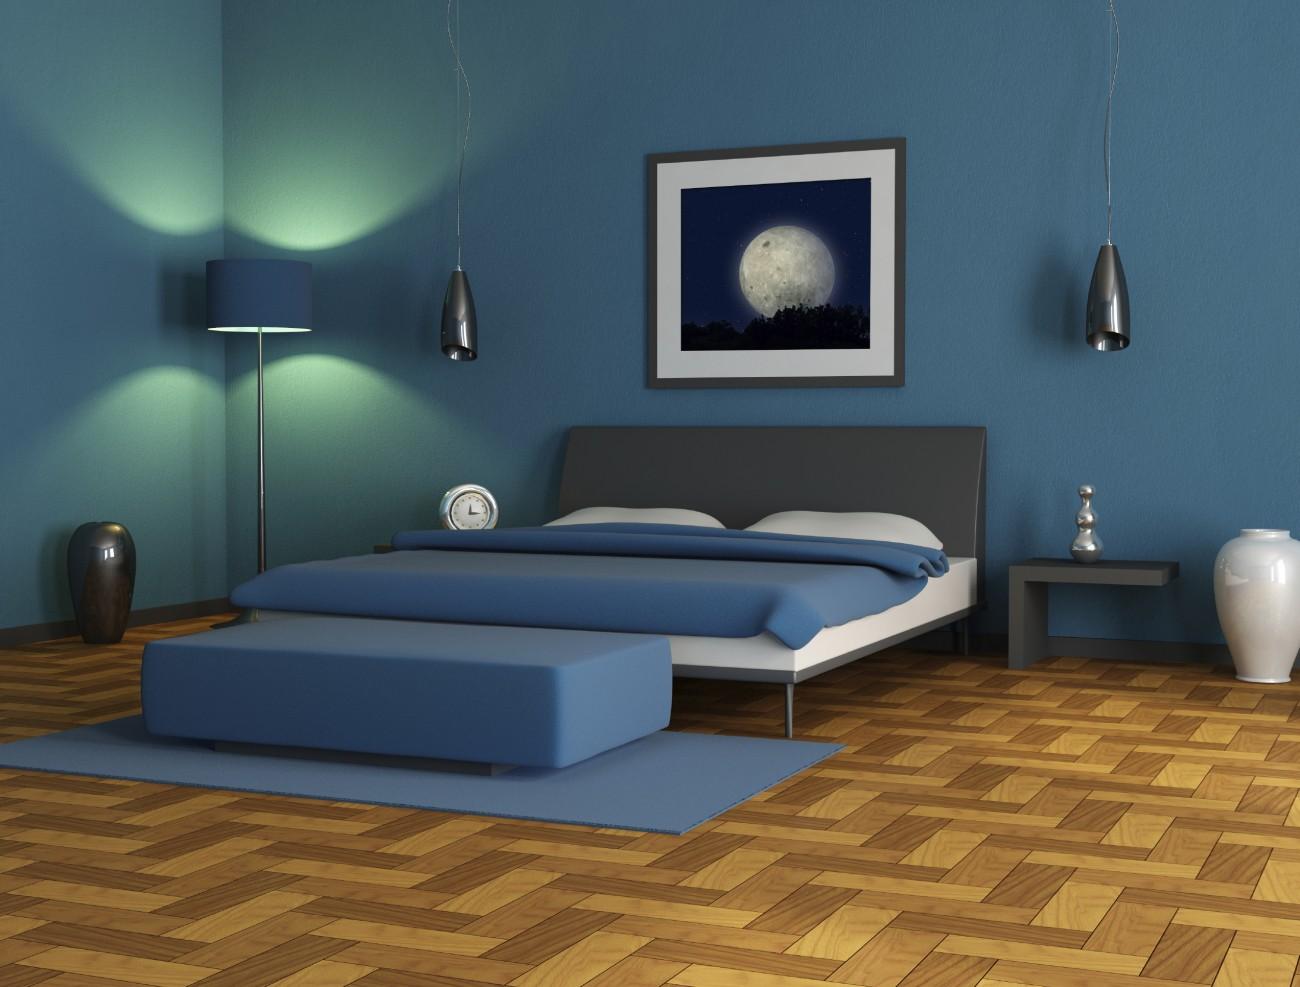 wandfarbe free wandfarbe grau fr af poesie der stille hf web with wandfarbe stunning wandfarbe. Black Bedroom Furniture Sets. Home Design Ideas